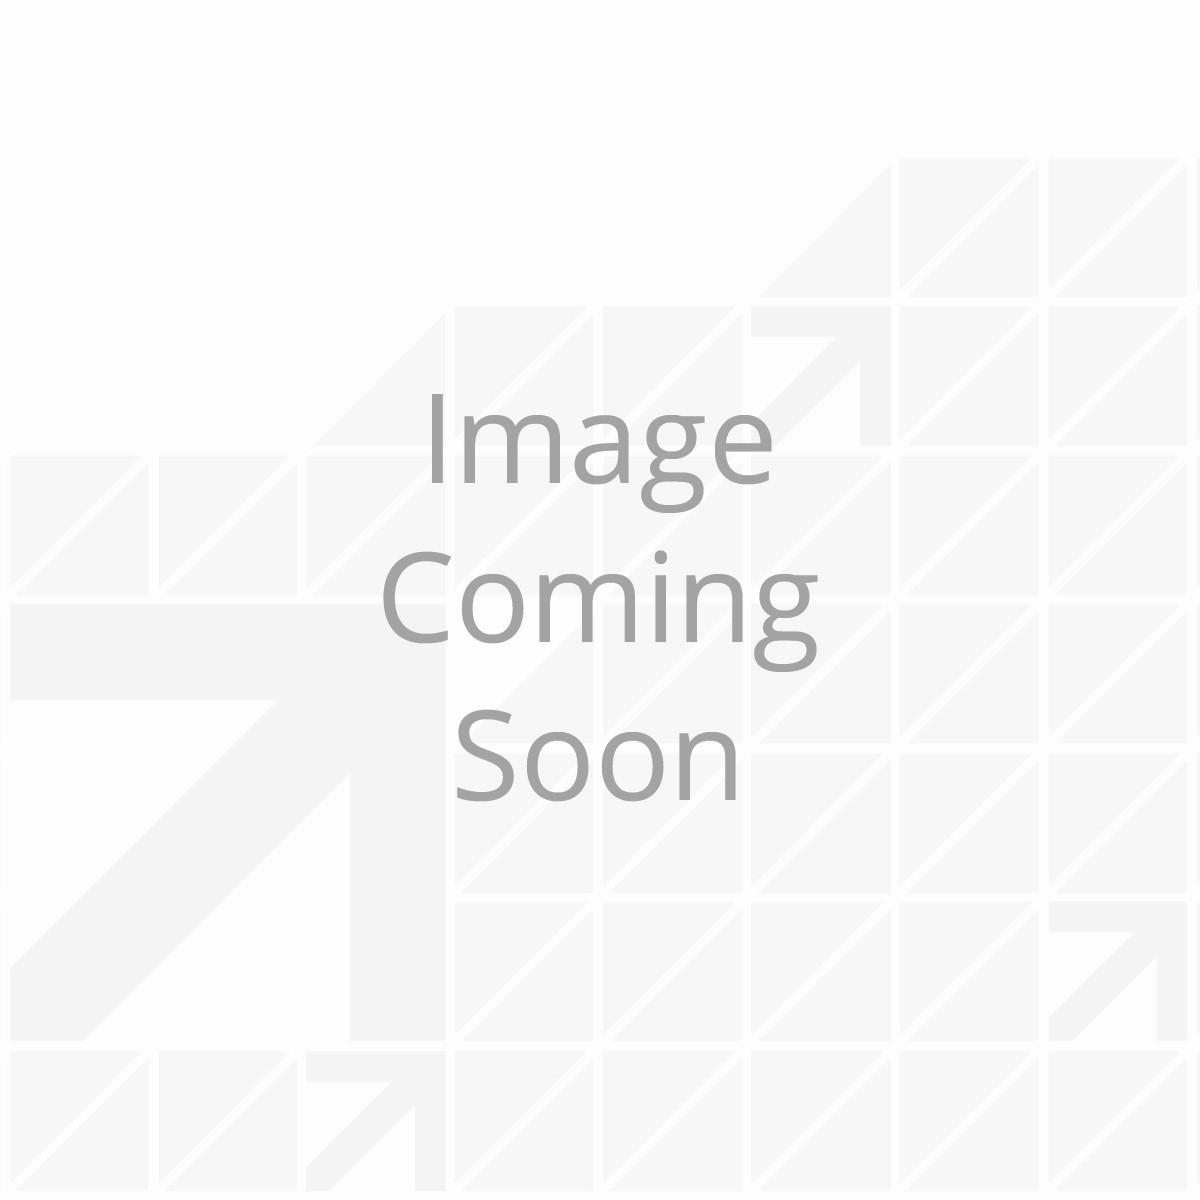 Xmc 3.51 X 1.86 X 2.5 X 2.5 Pc Black